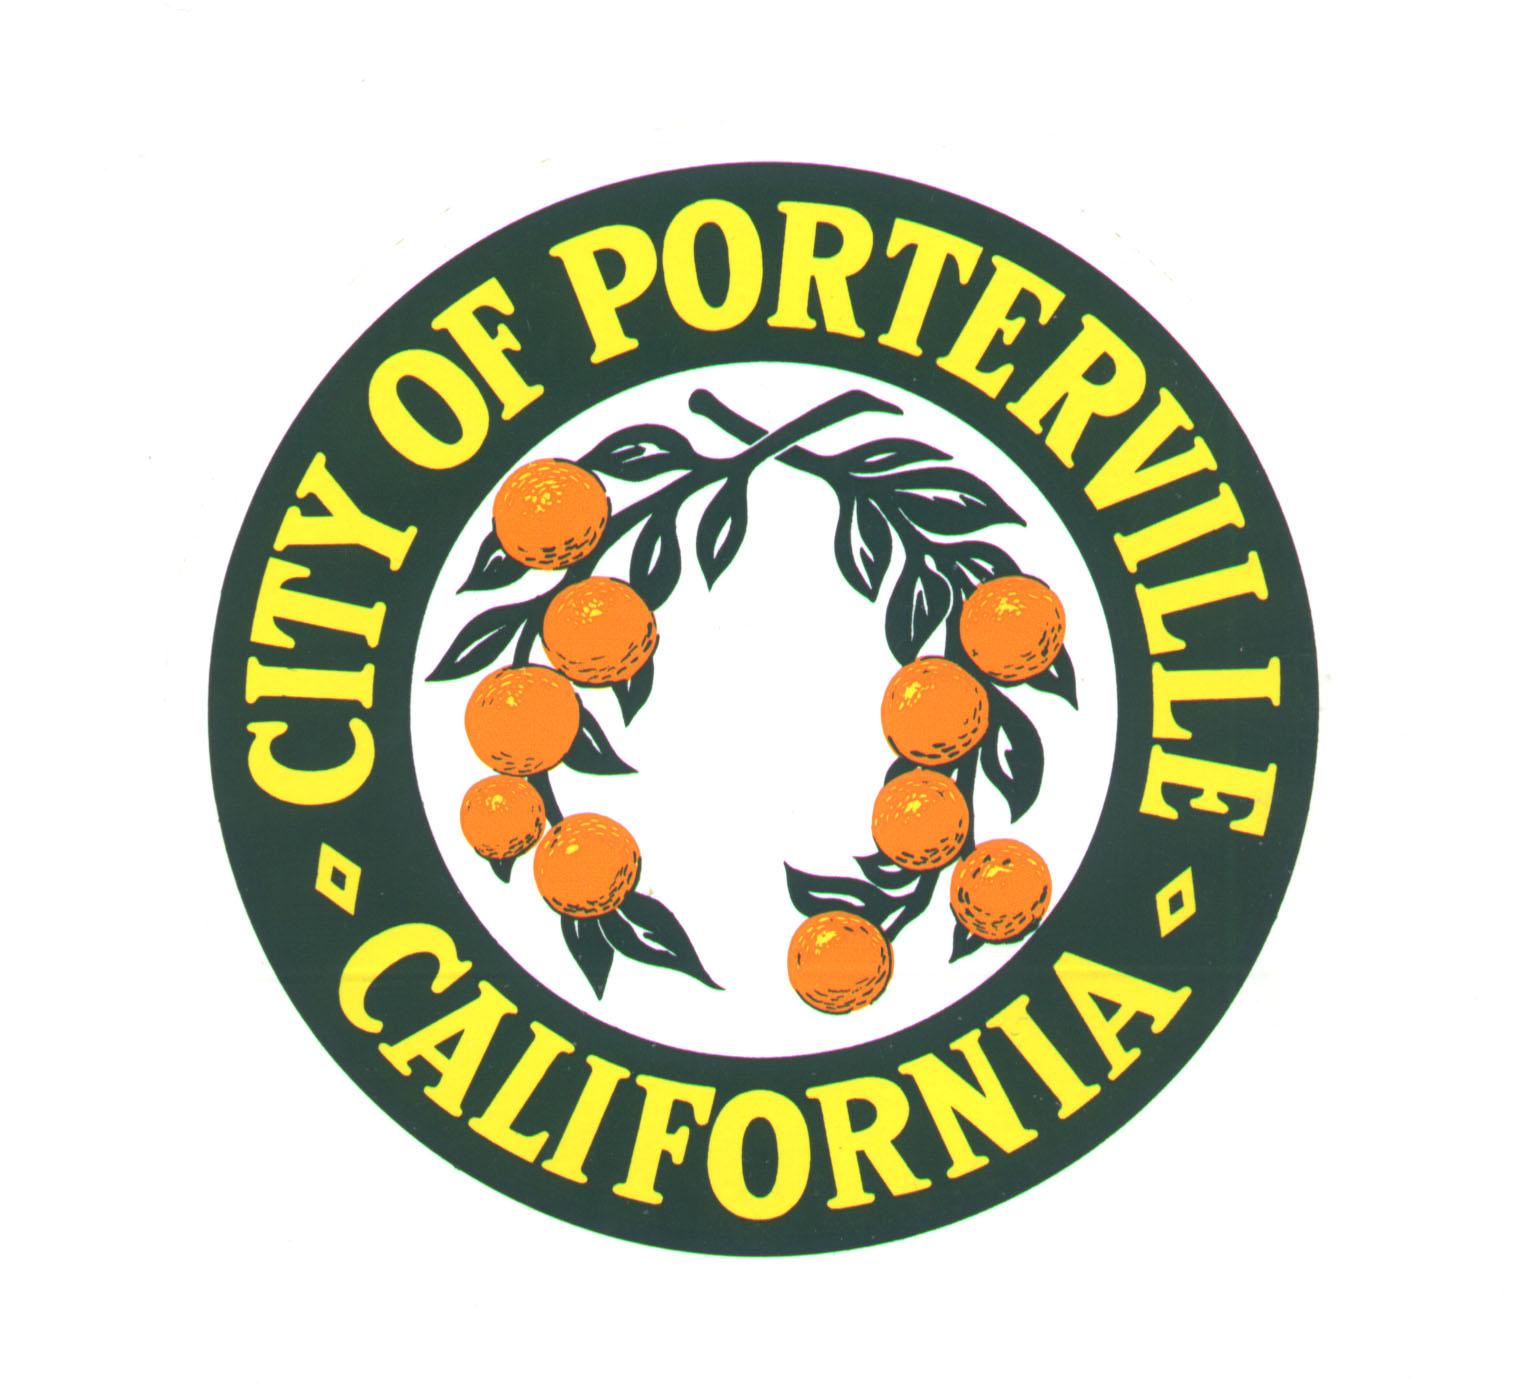 City of Porterville, California